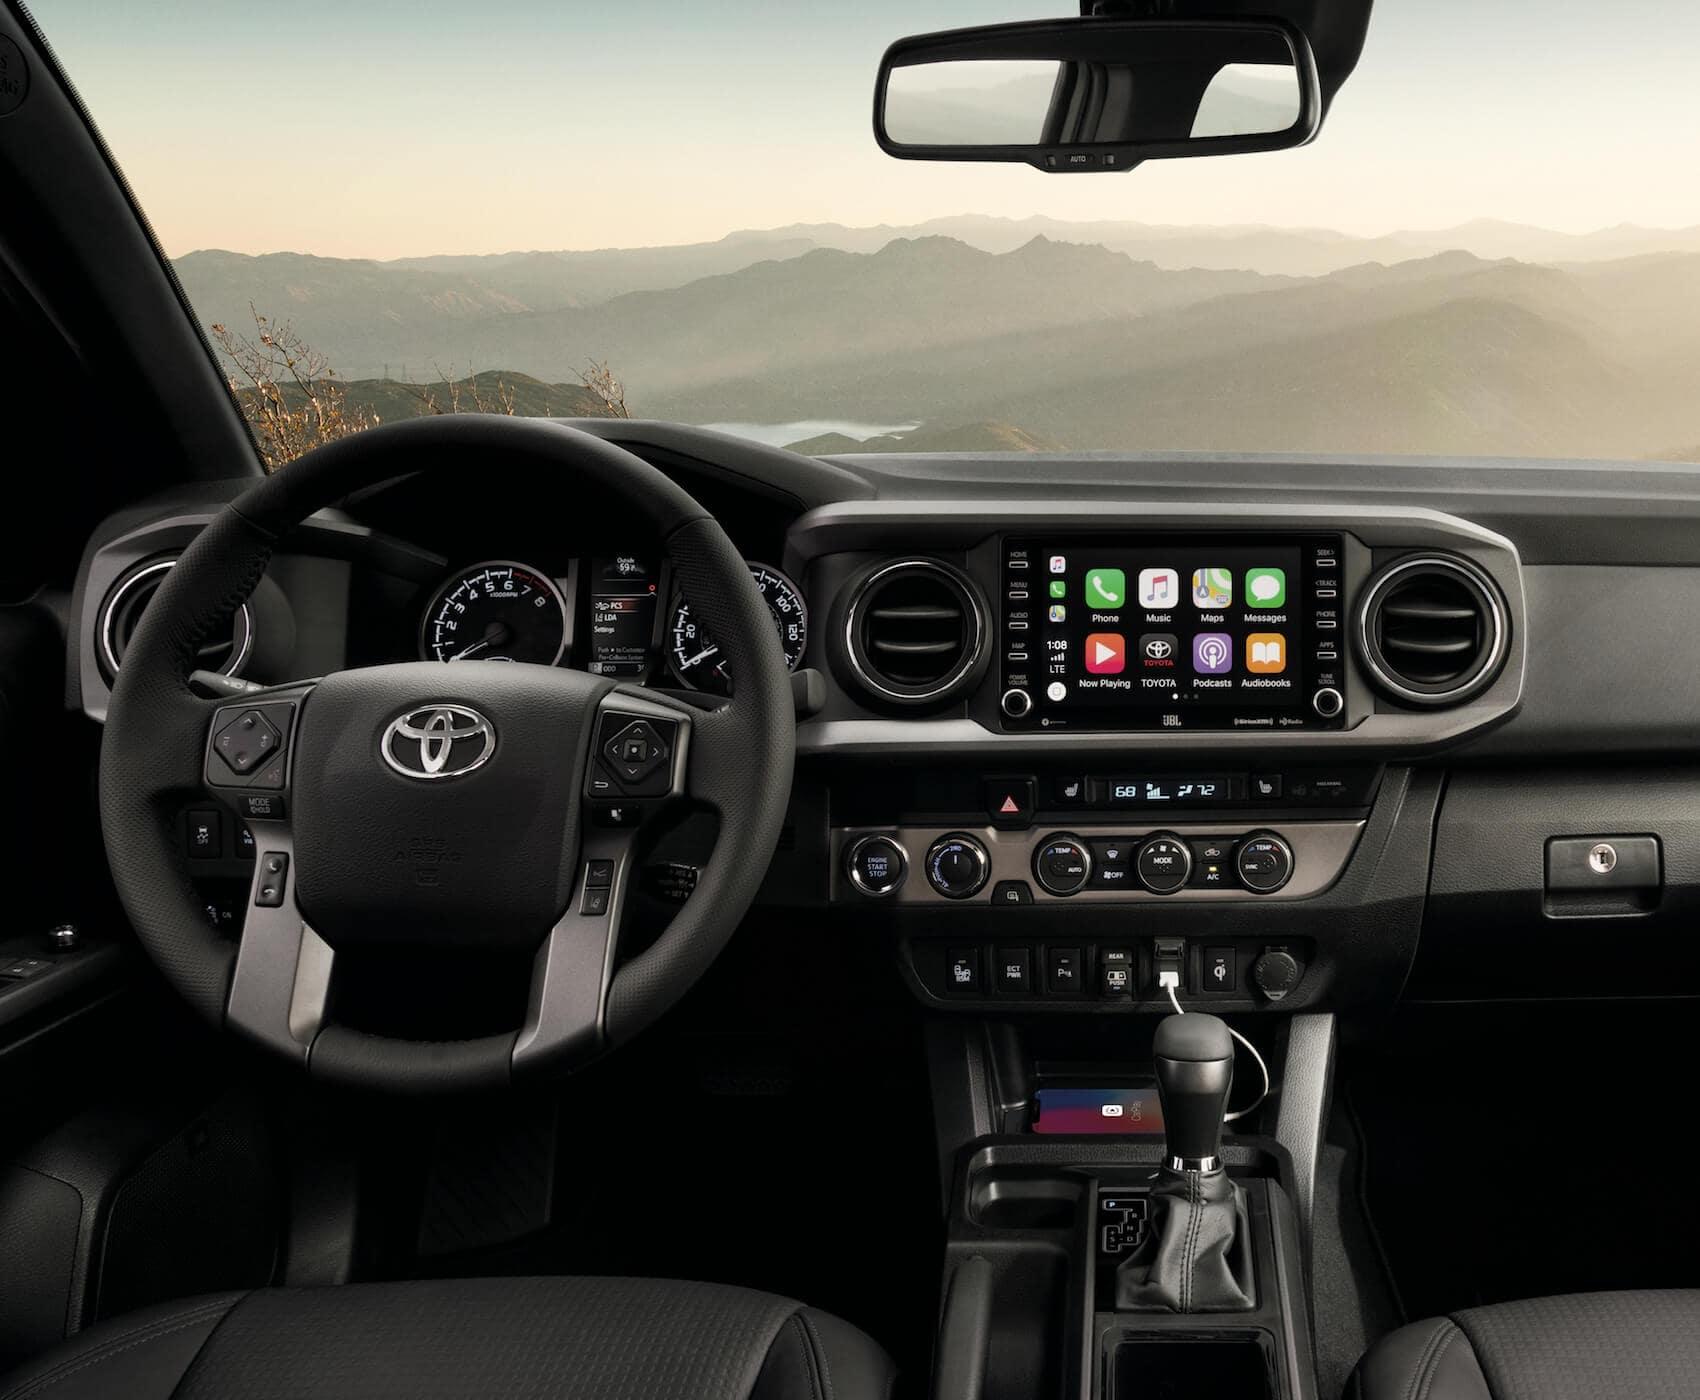 2020 Toyota Tacoma MPG Trevose, PA